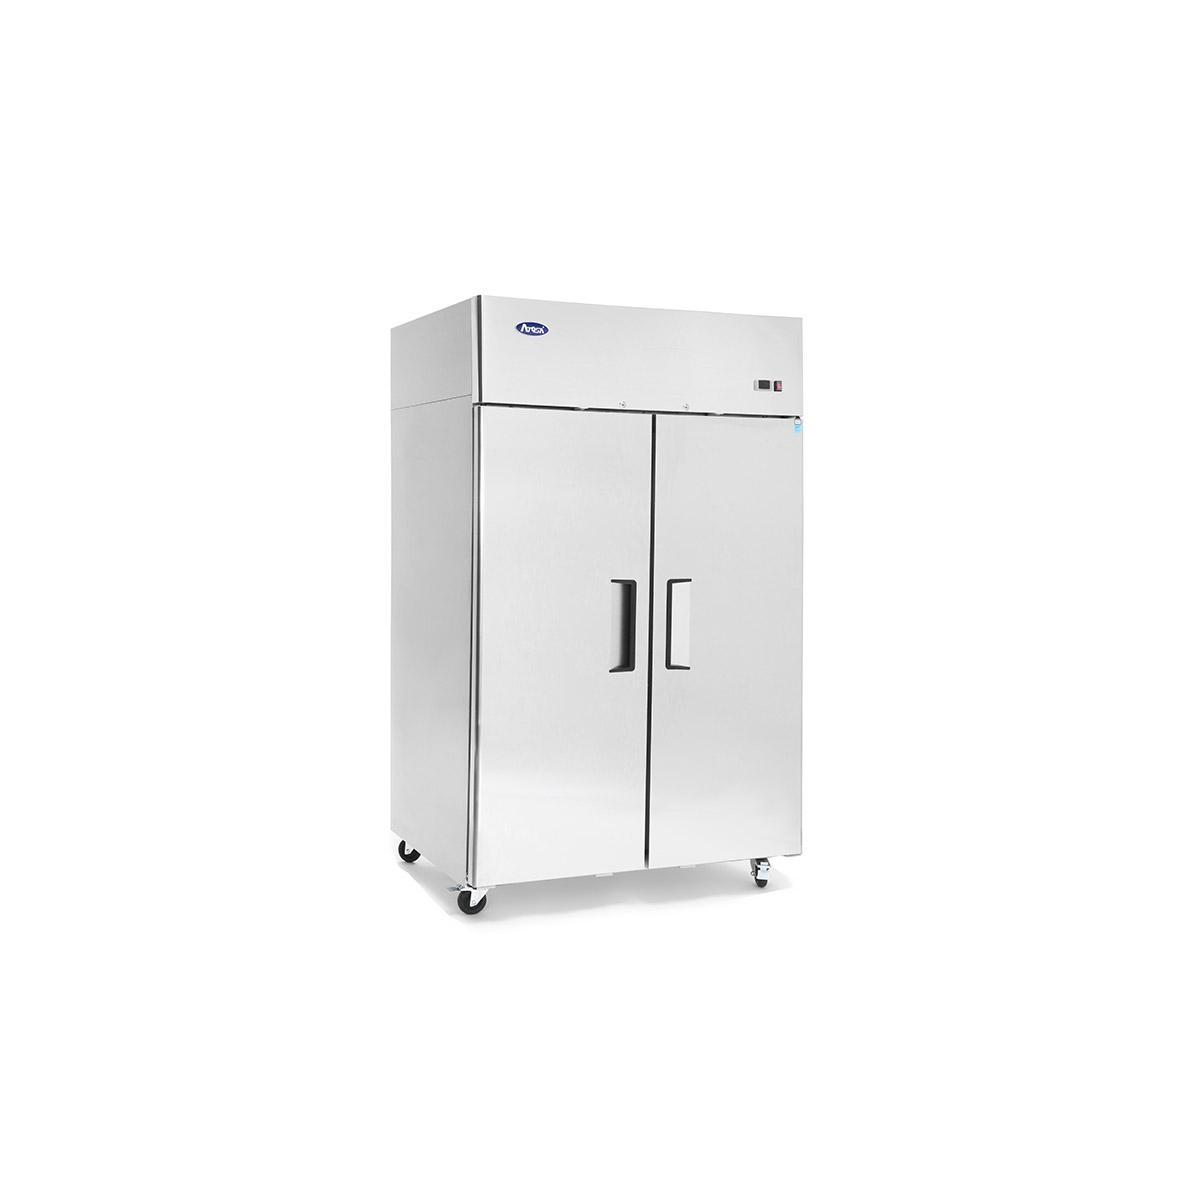 Atosa YBF9218GR Slimline Upright Double Door Fridge